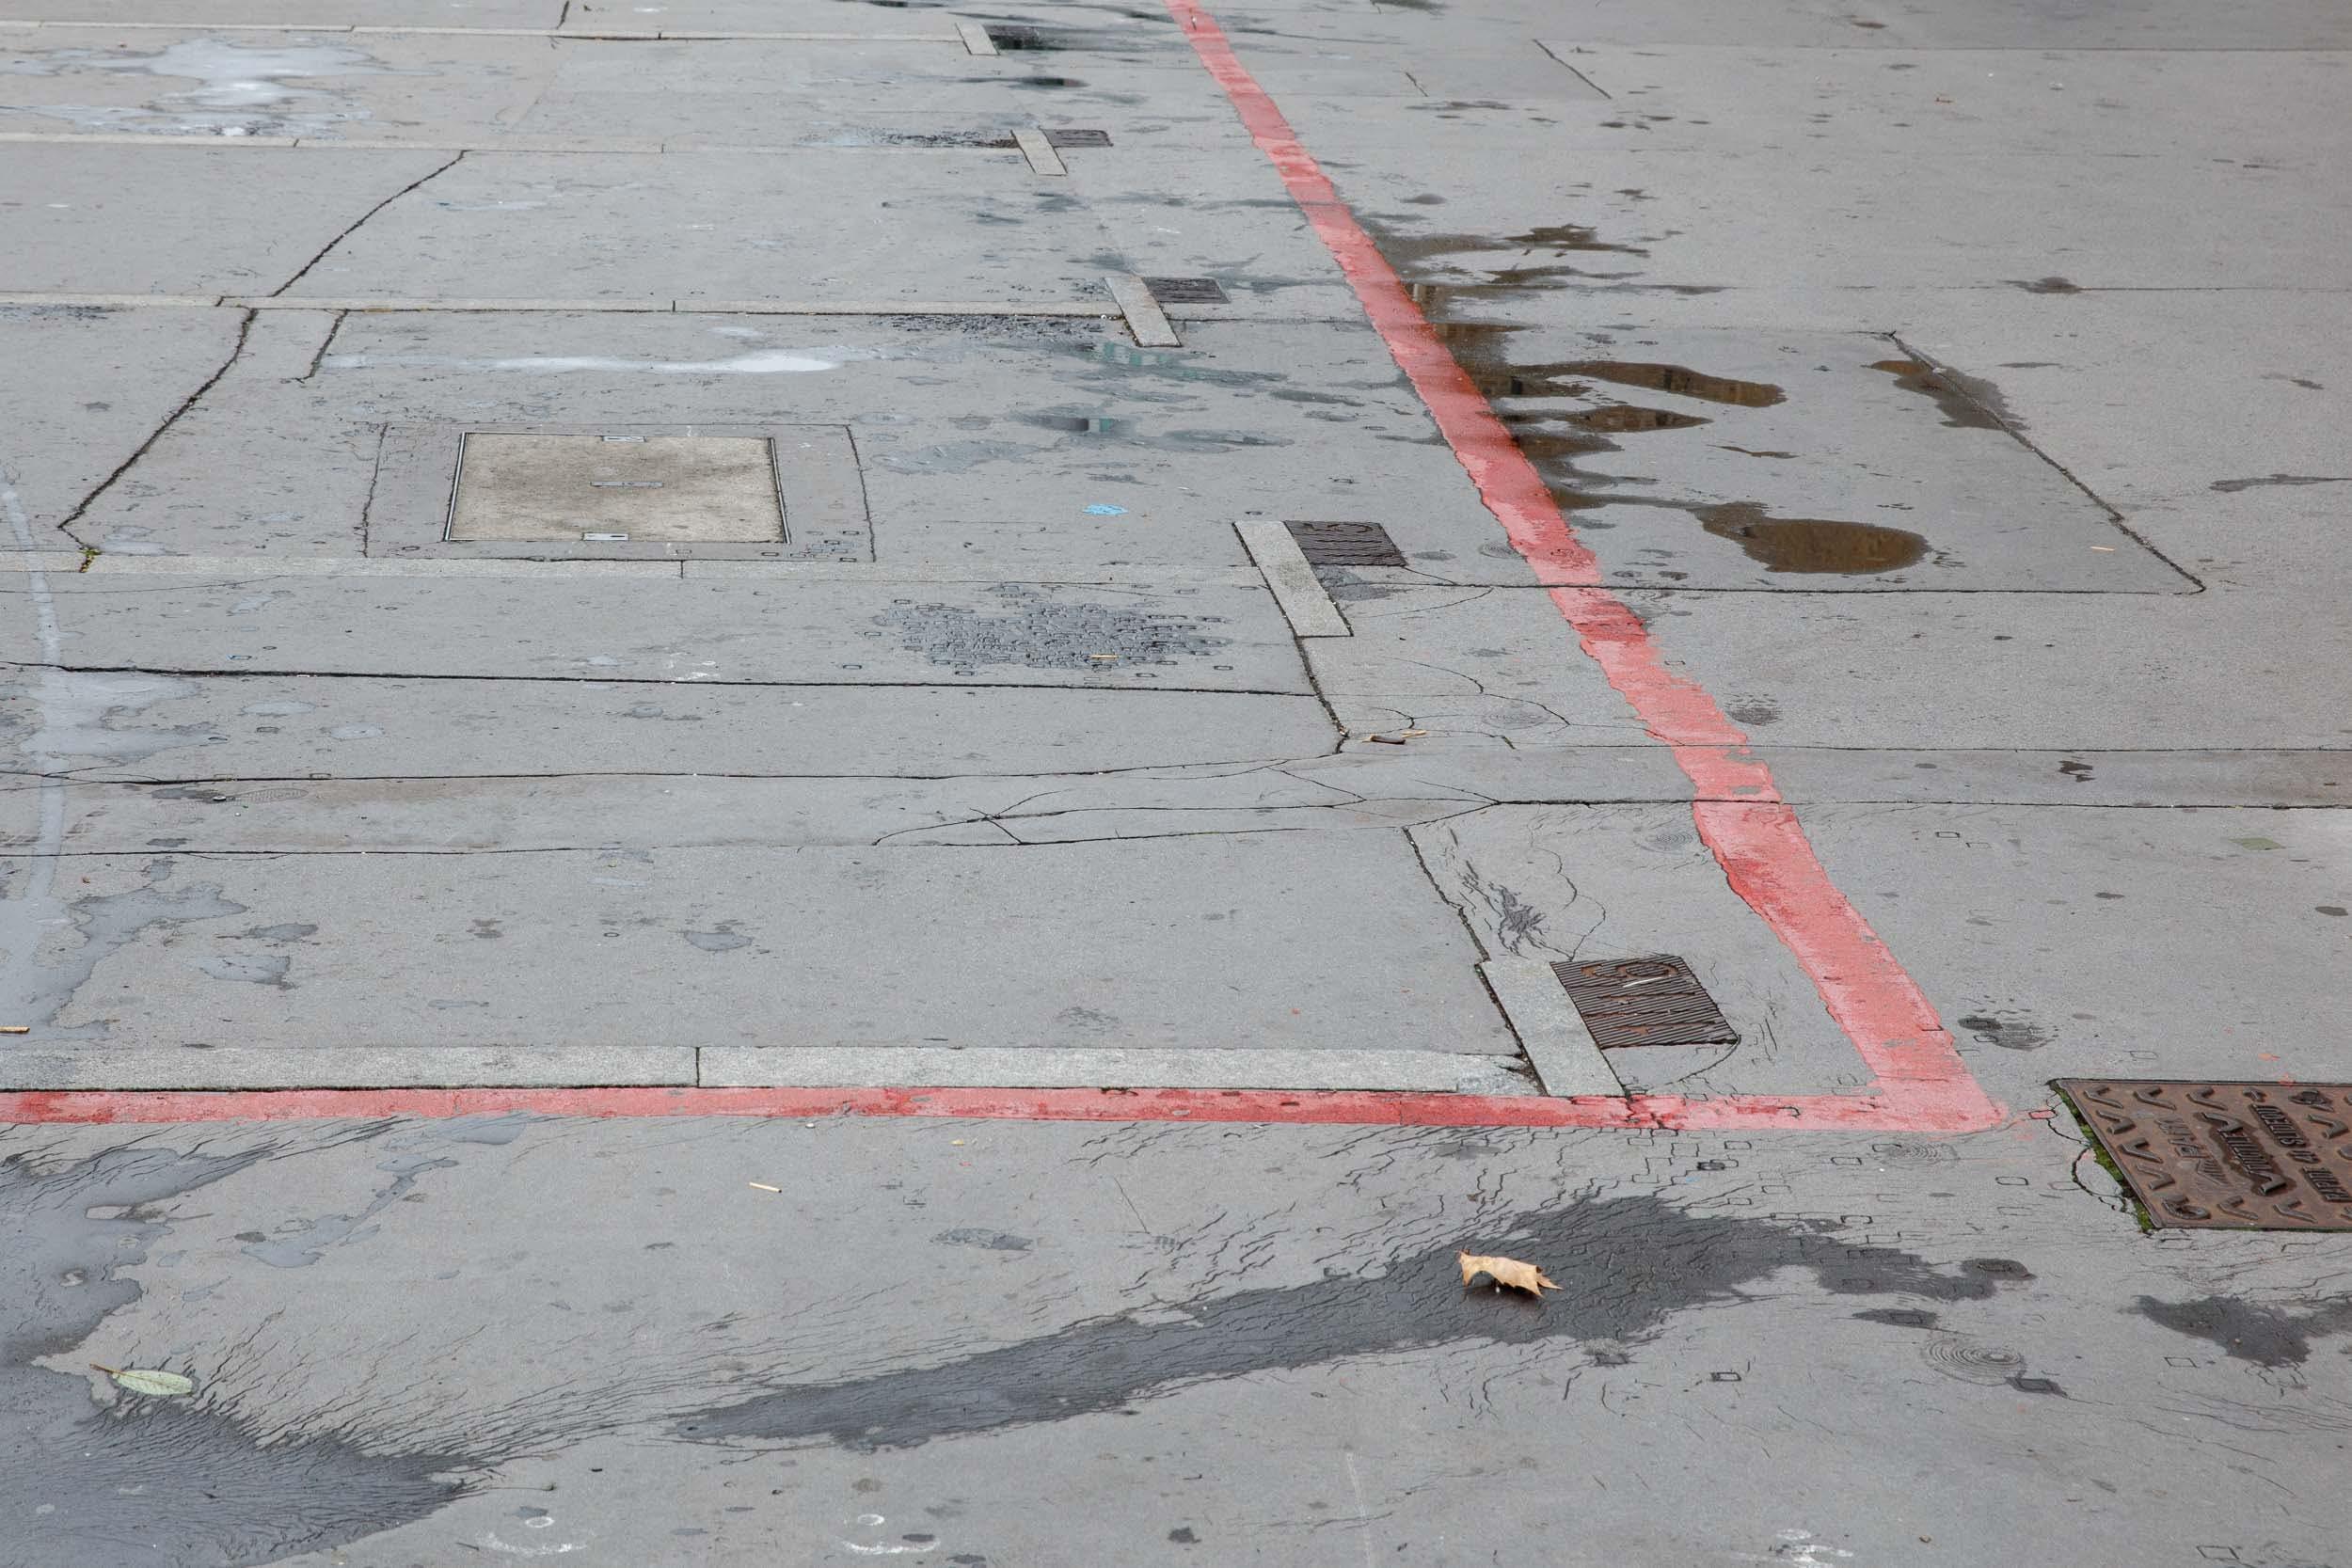 Whitechapel Road Existing Challenges